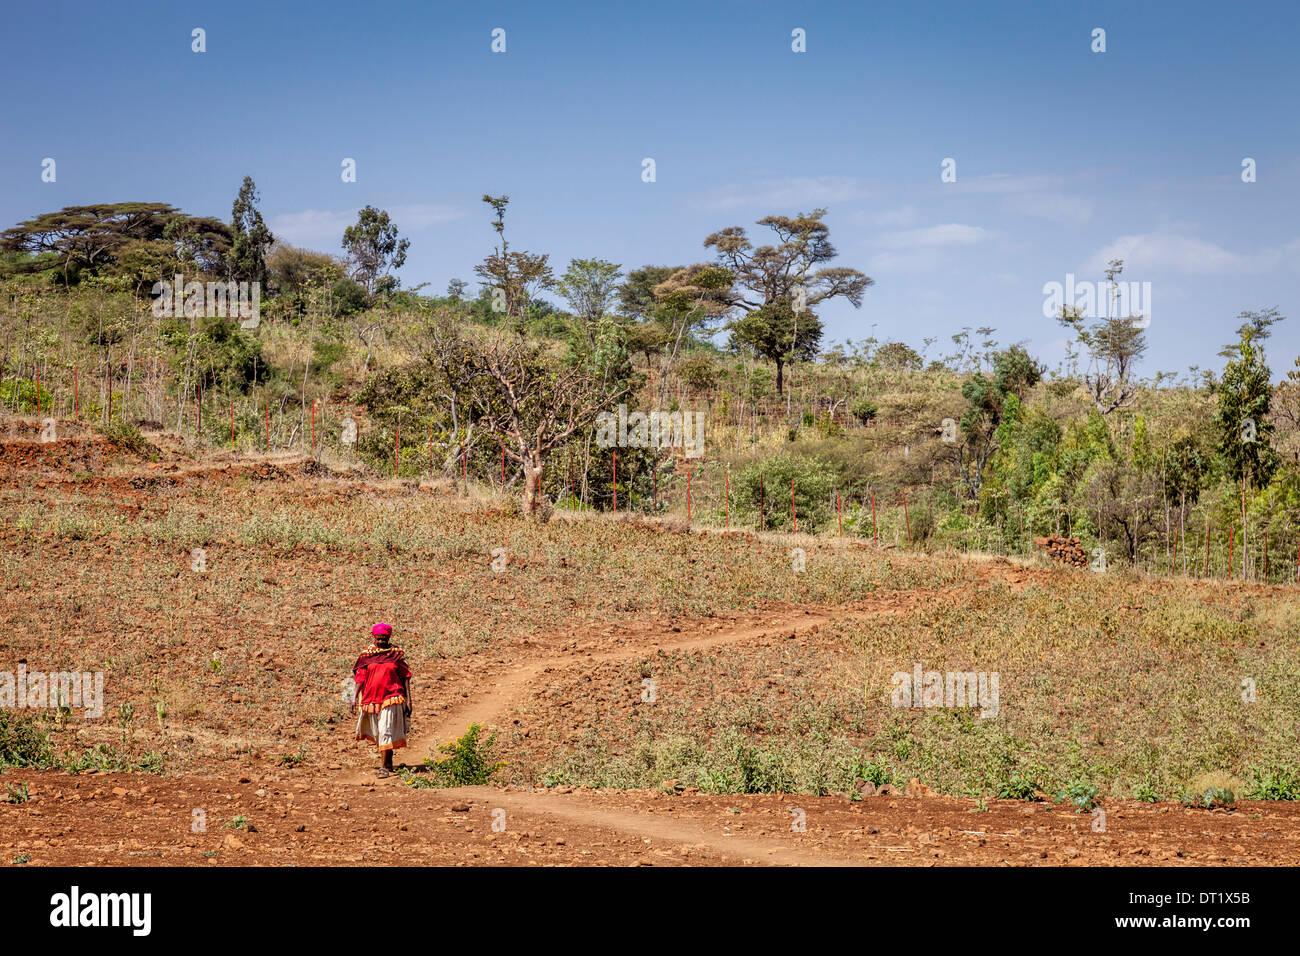 The Konso Landscape, Konso Region, Ethiopia - Stock Image